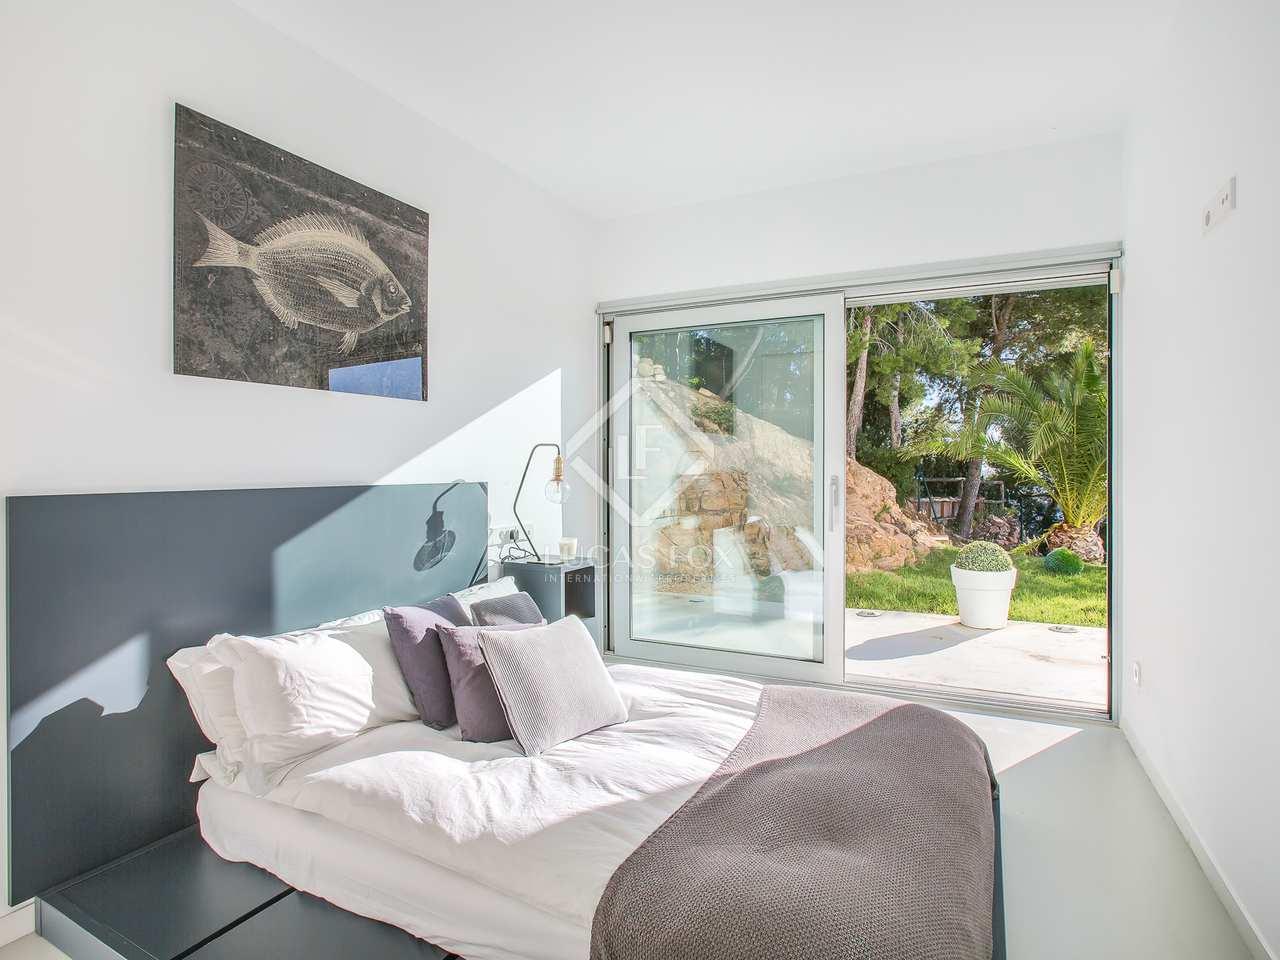 4 bett costa brava designervilla zum verkauf nahe tamariu. Black Bedroom Furniture Sets. Home Design Ideas